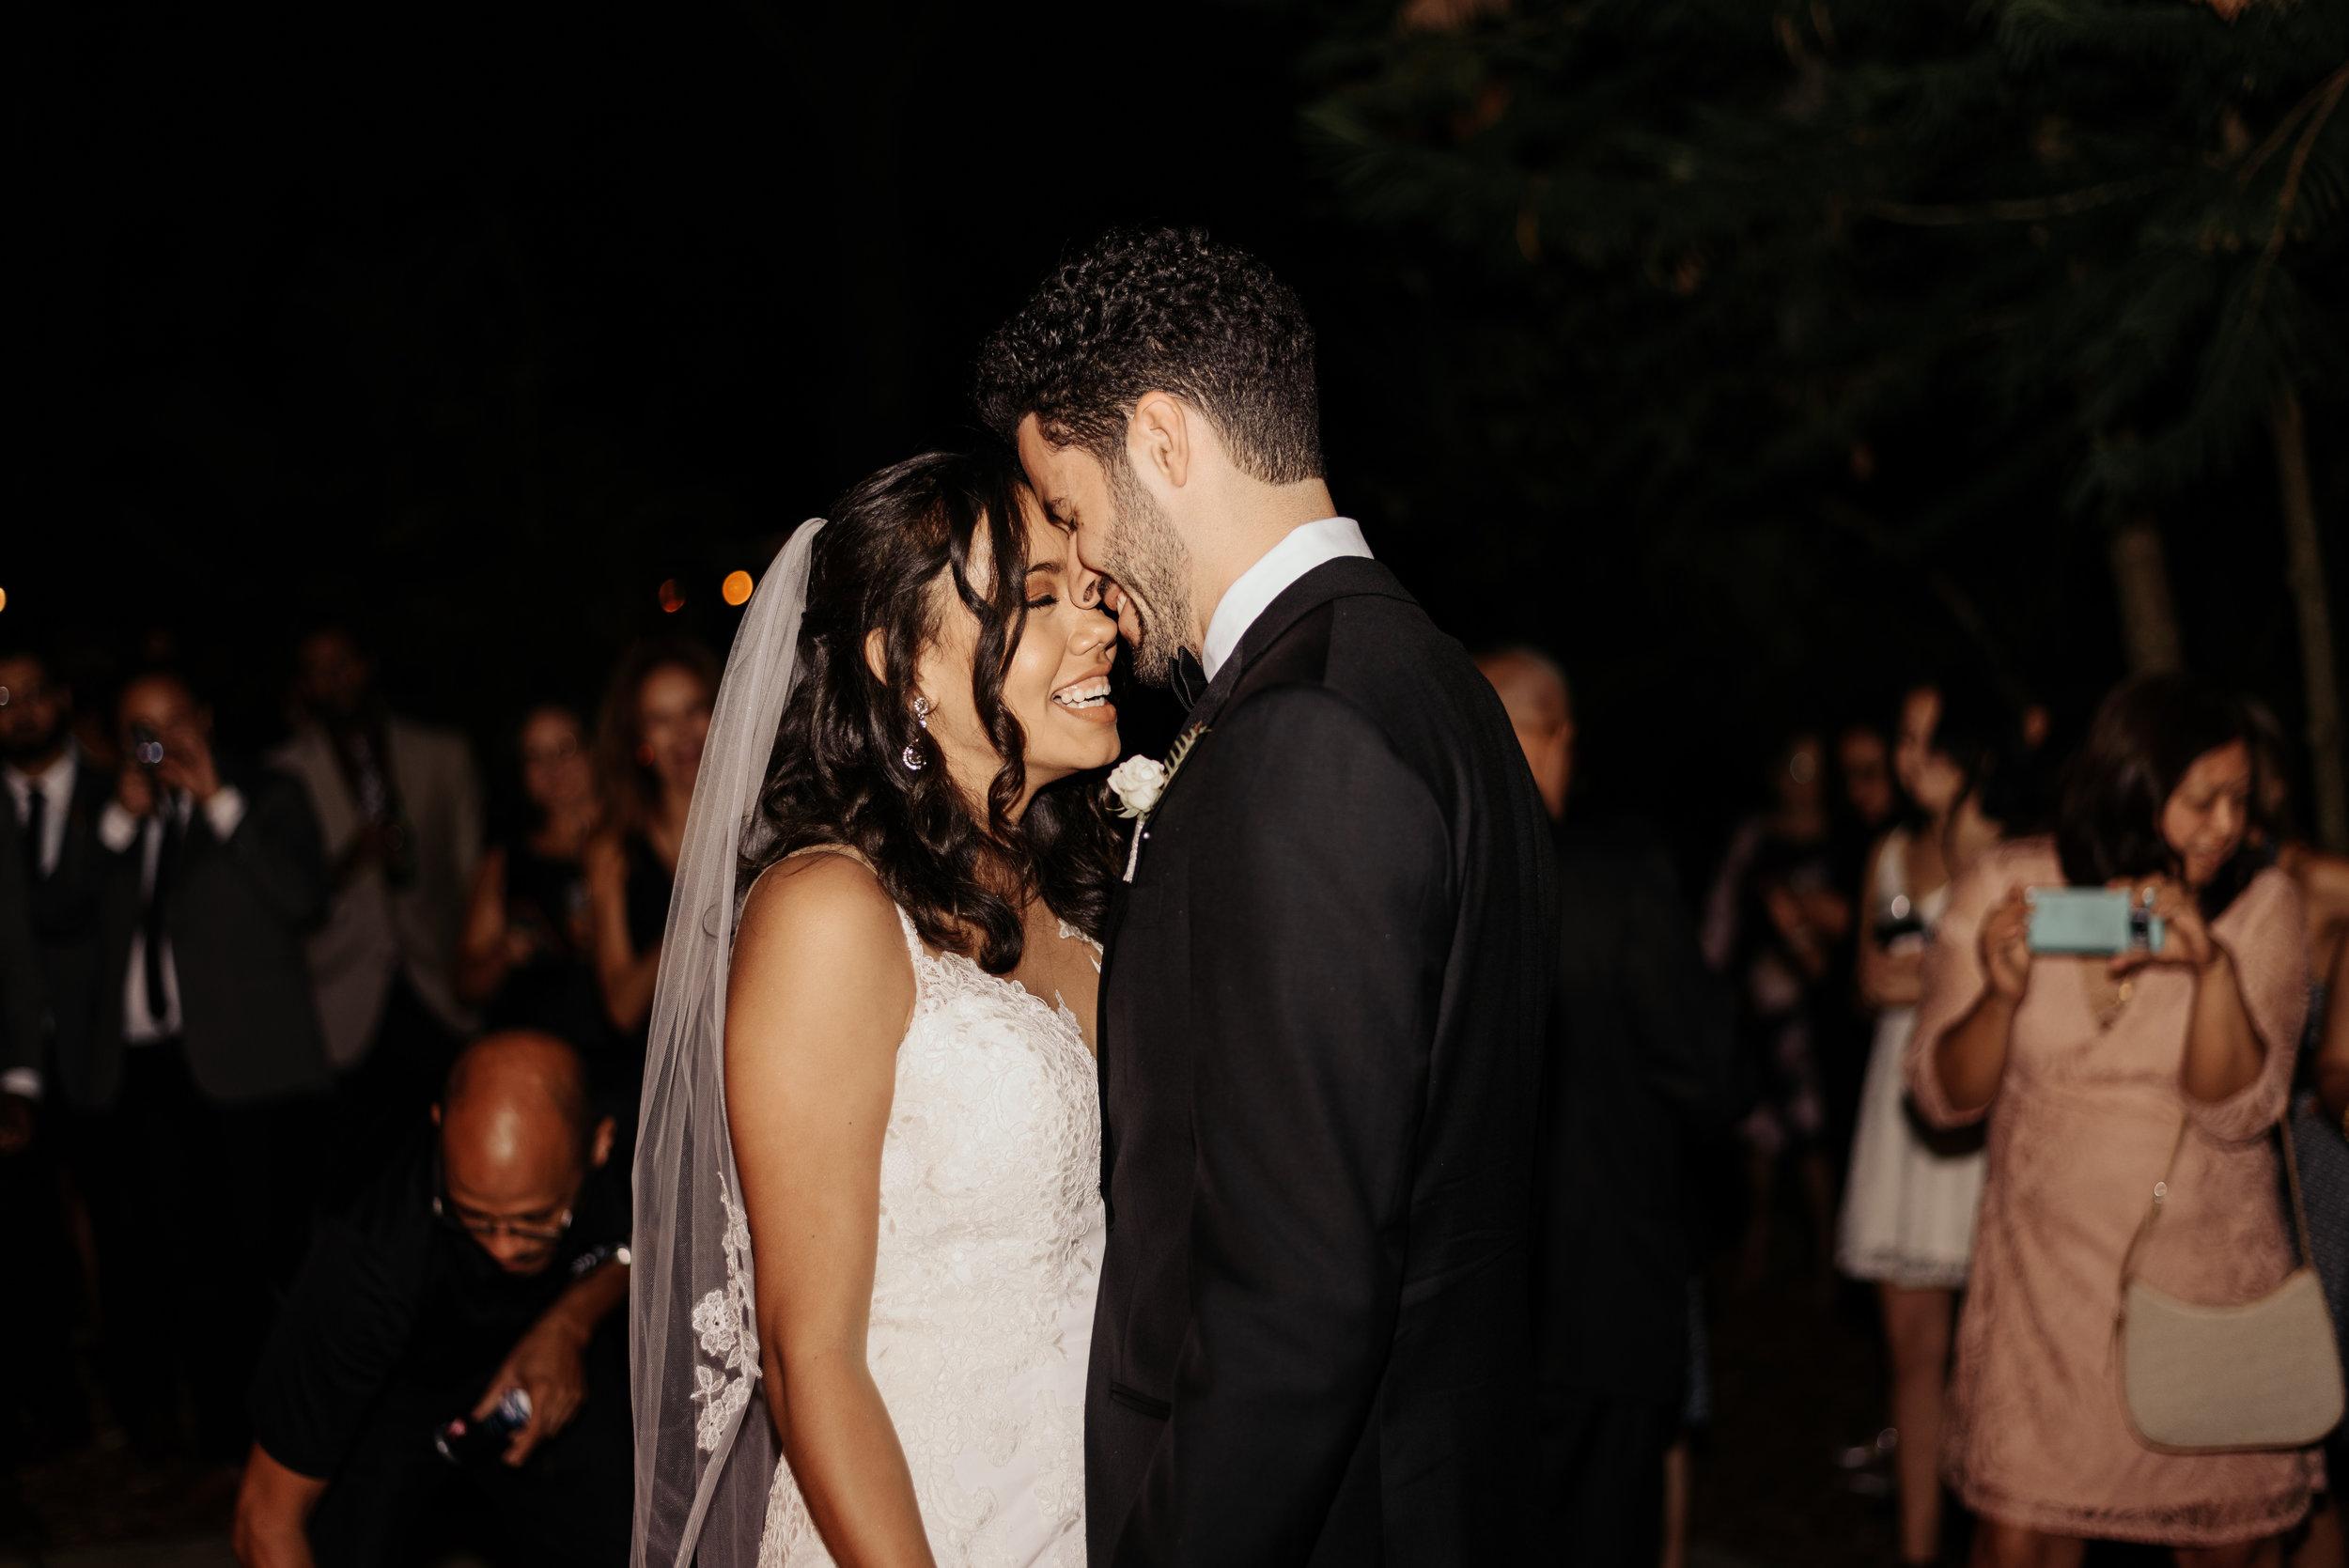 Kirstie-AJ-Wedding-9177.jpg